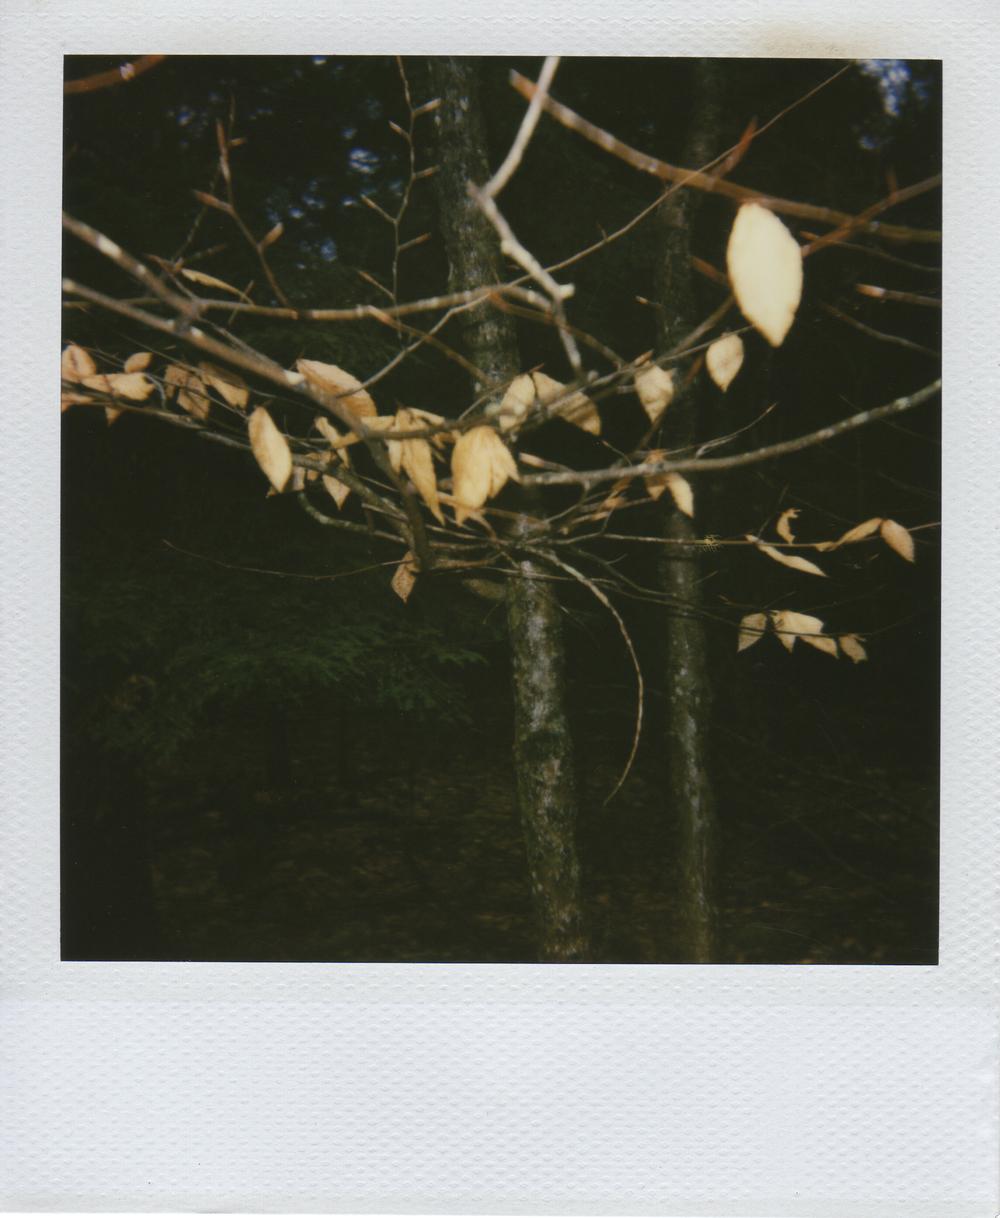 jlaurence-polaroid-069.jpg